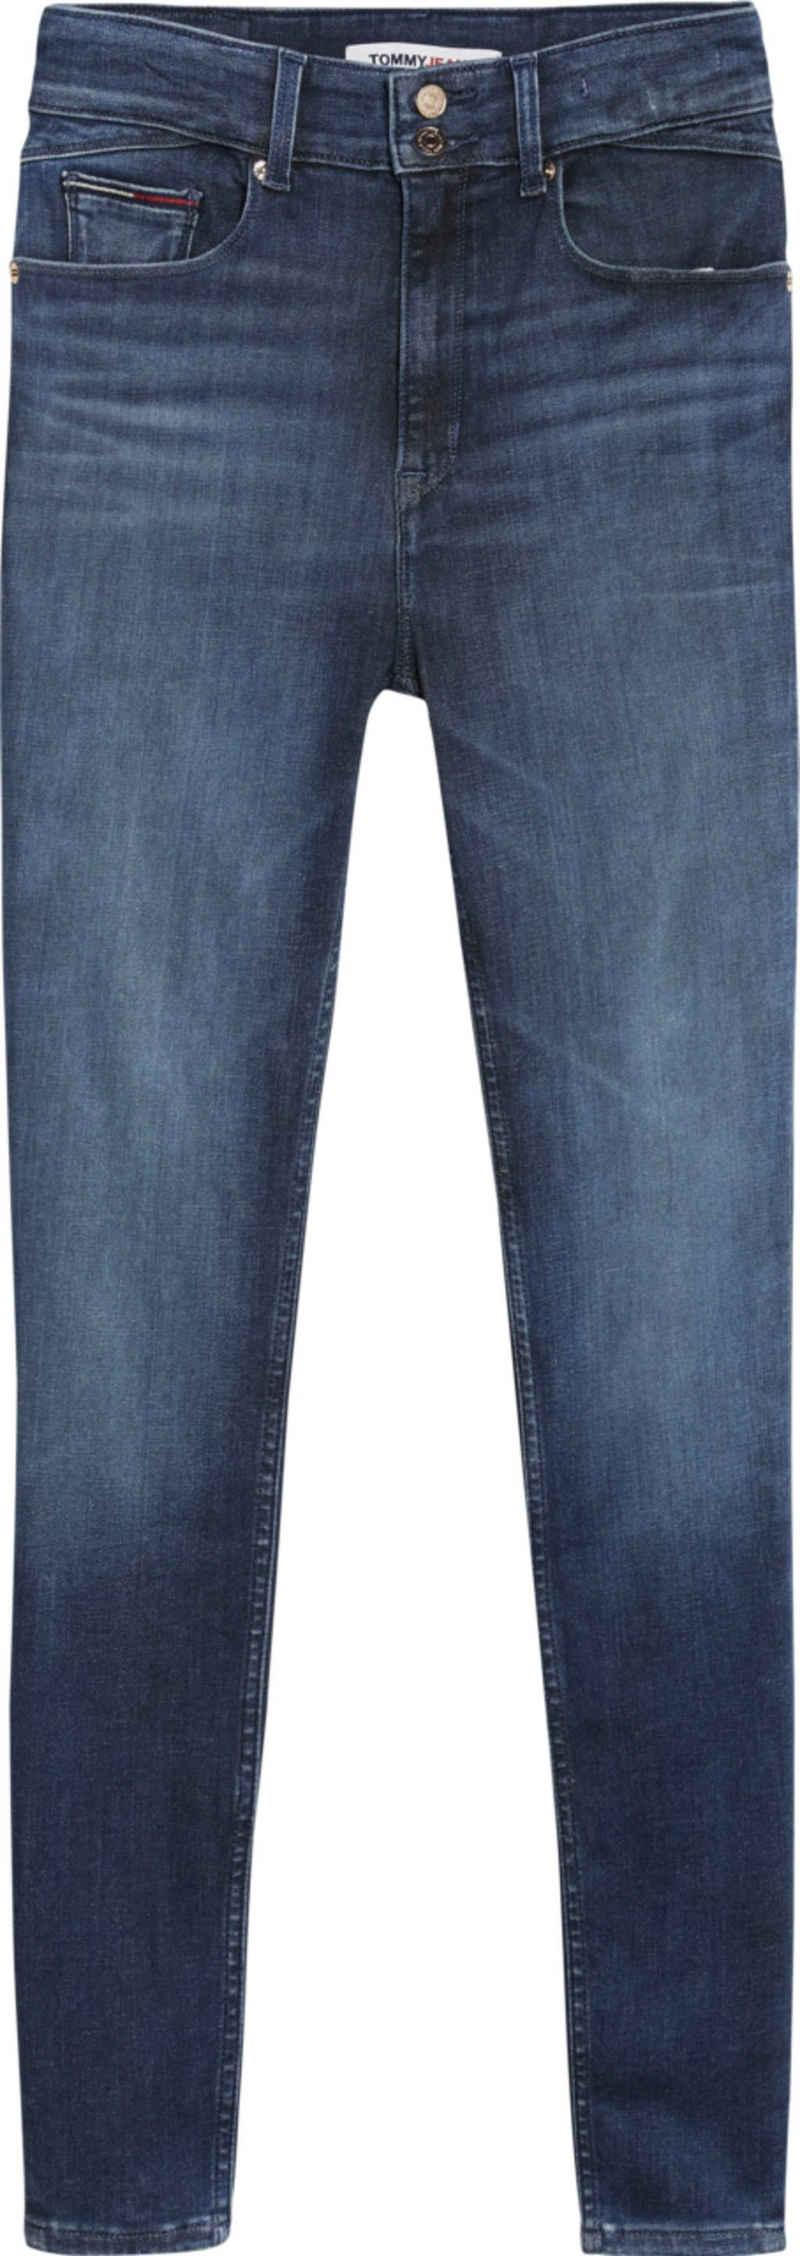 Tommy Jeans Skinny-fit-Jeans »SHAPE HR SKNY BE352 DBDYSHP« mit Push-up Effekt für einen perfekten Sitz